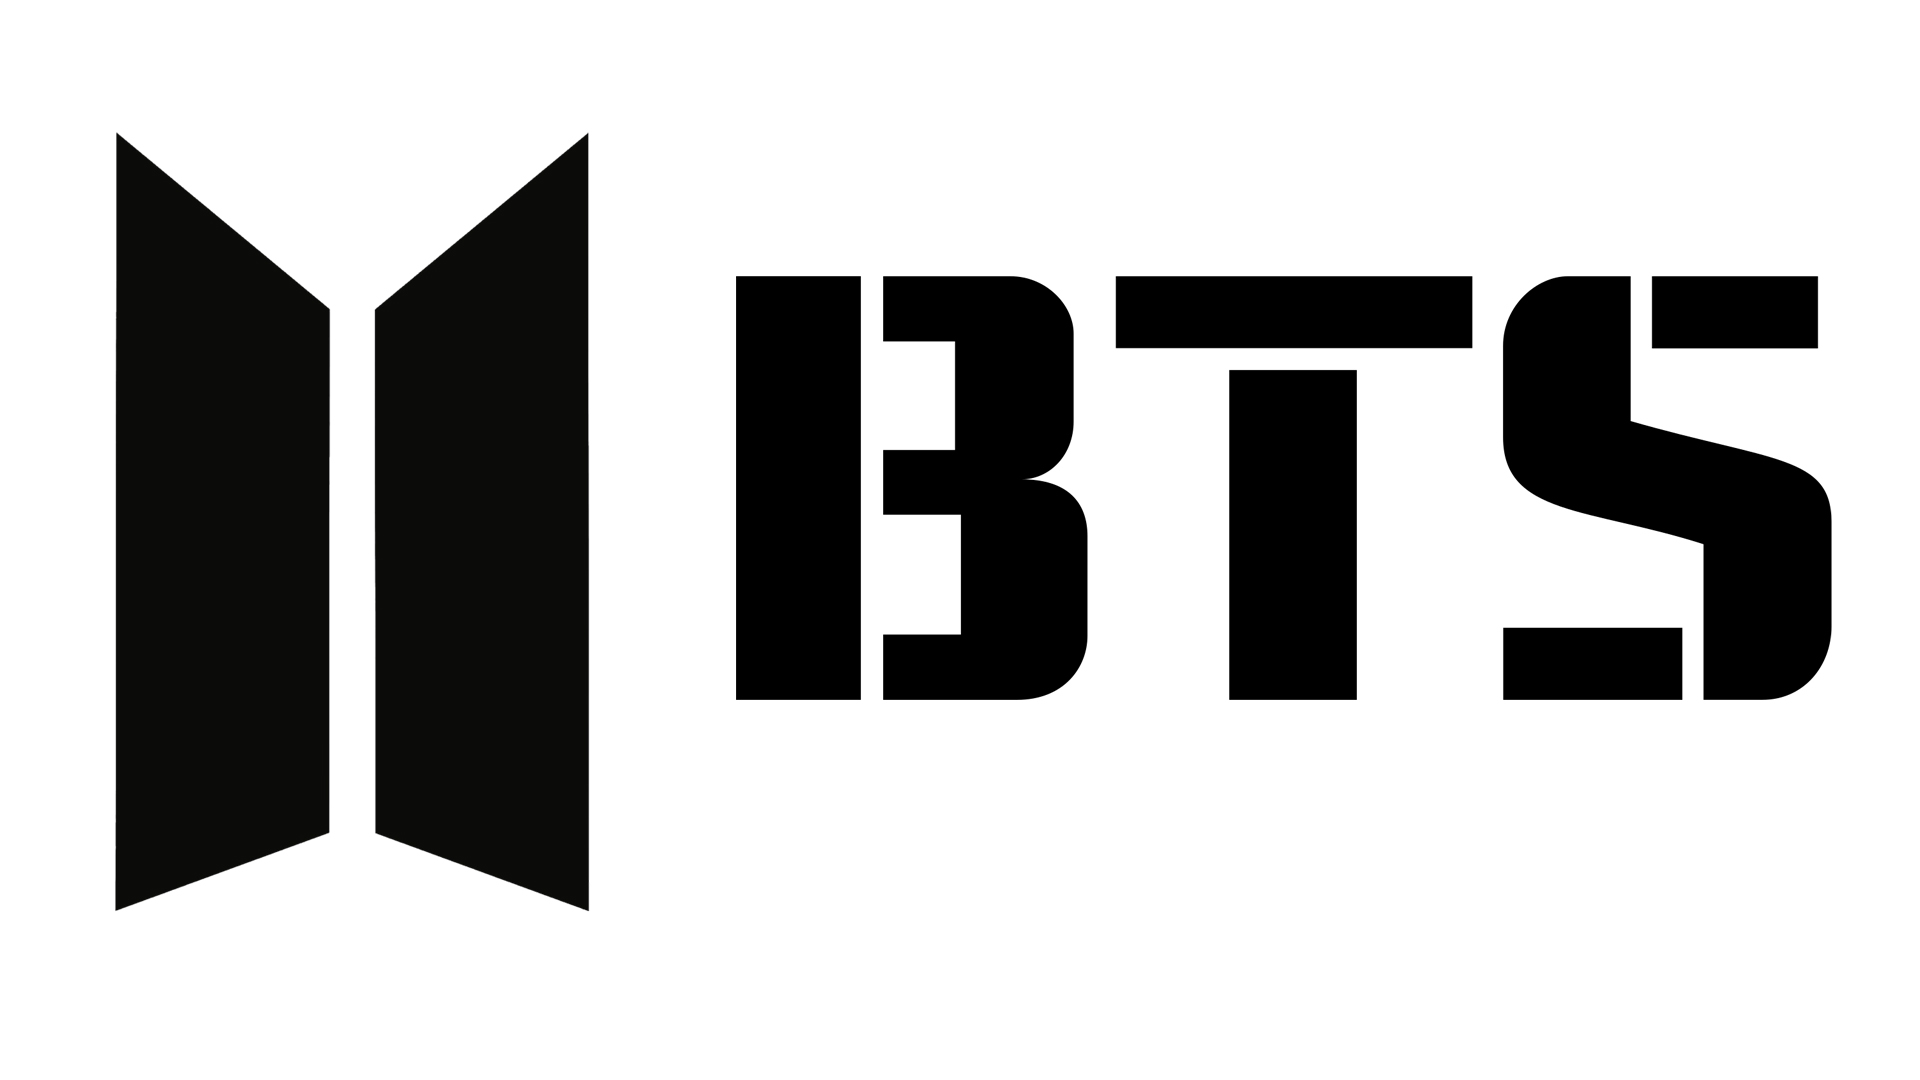 bts logo bts symbol meaning history and evolution